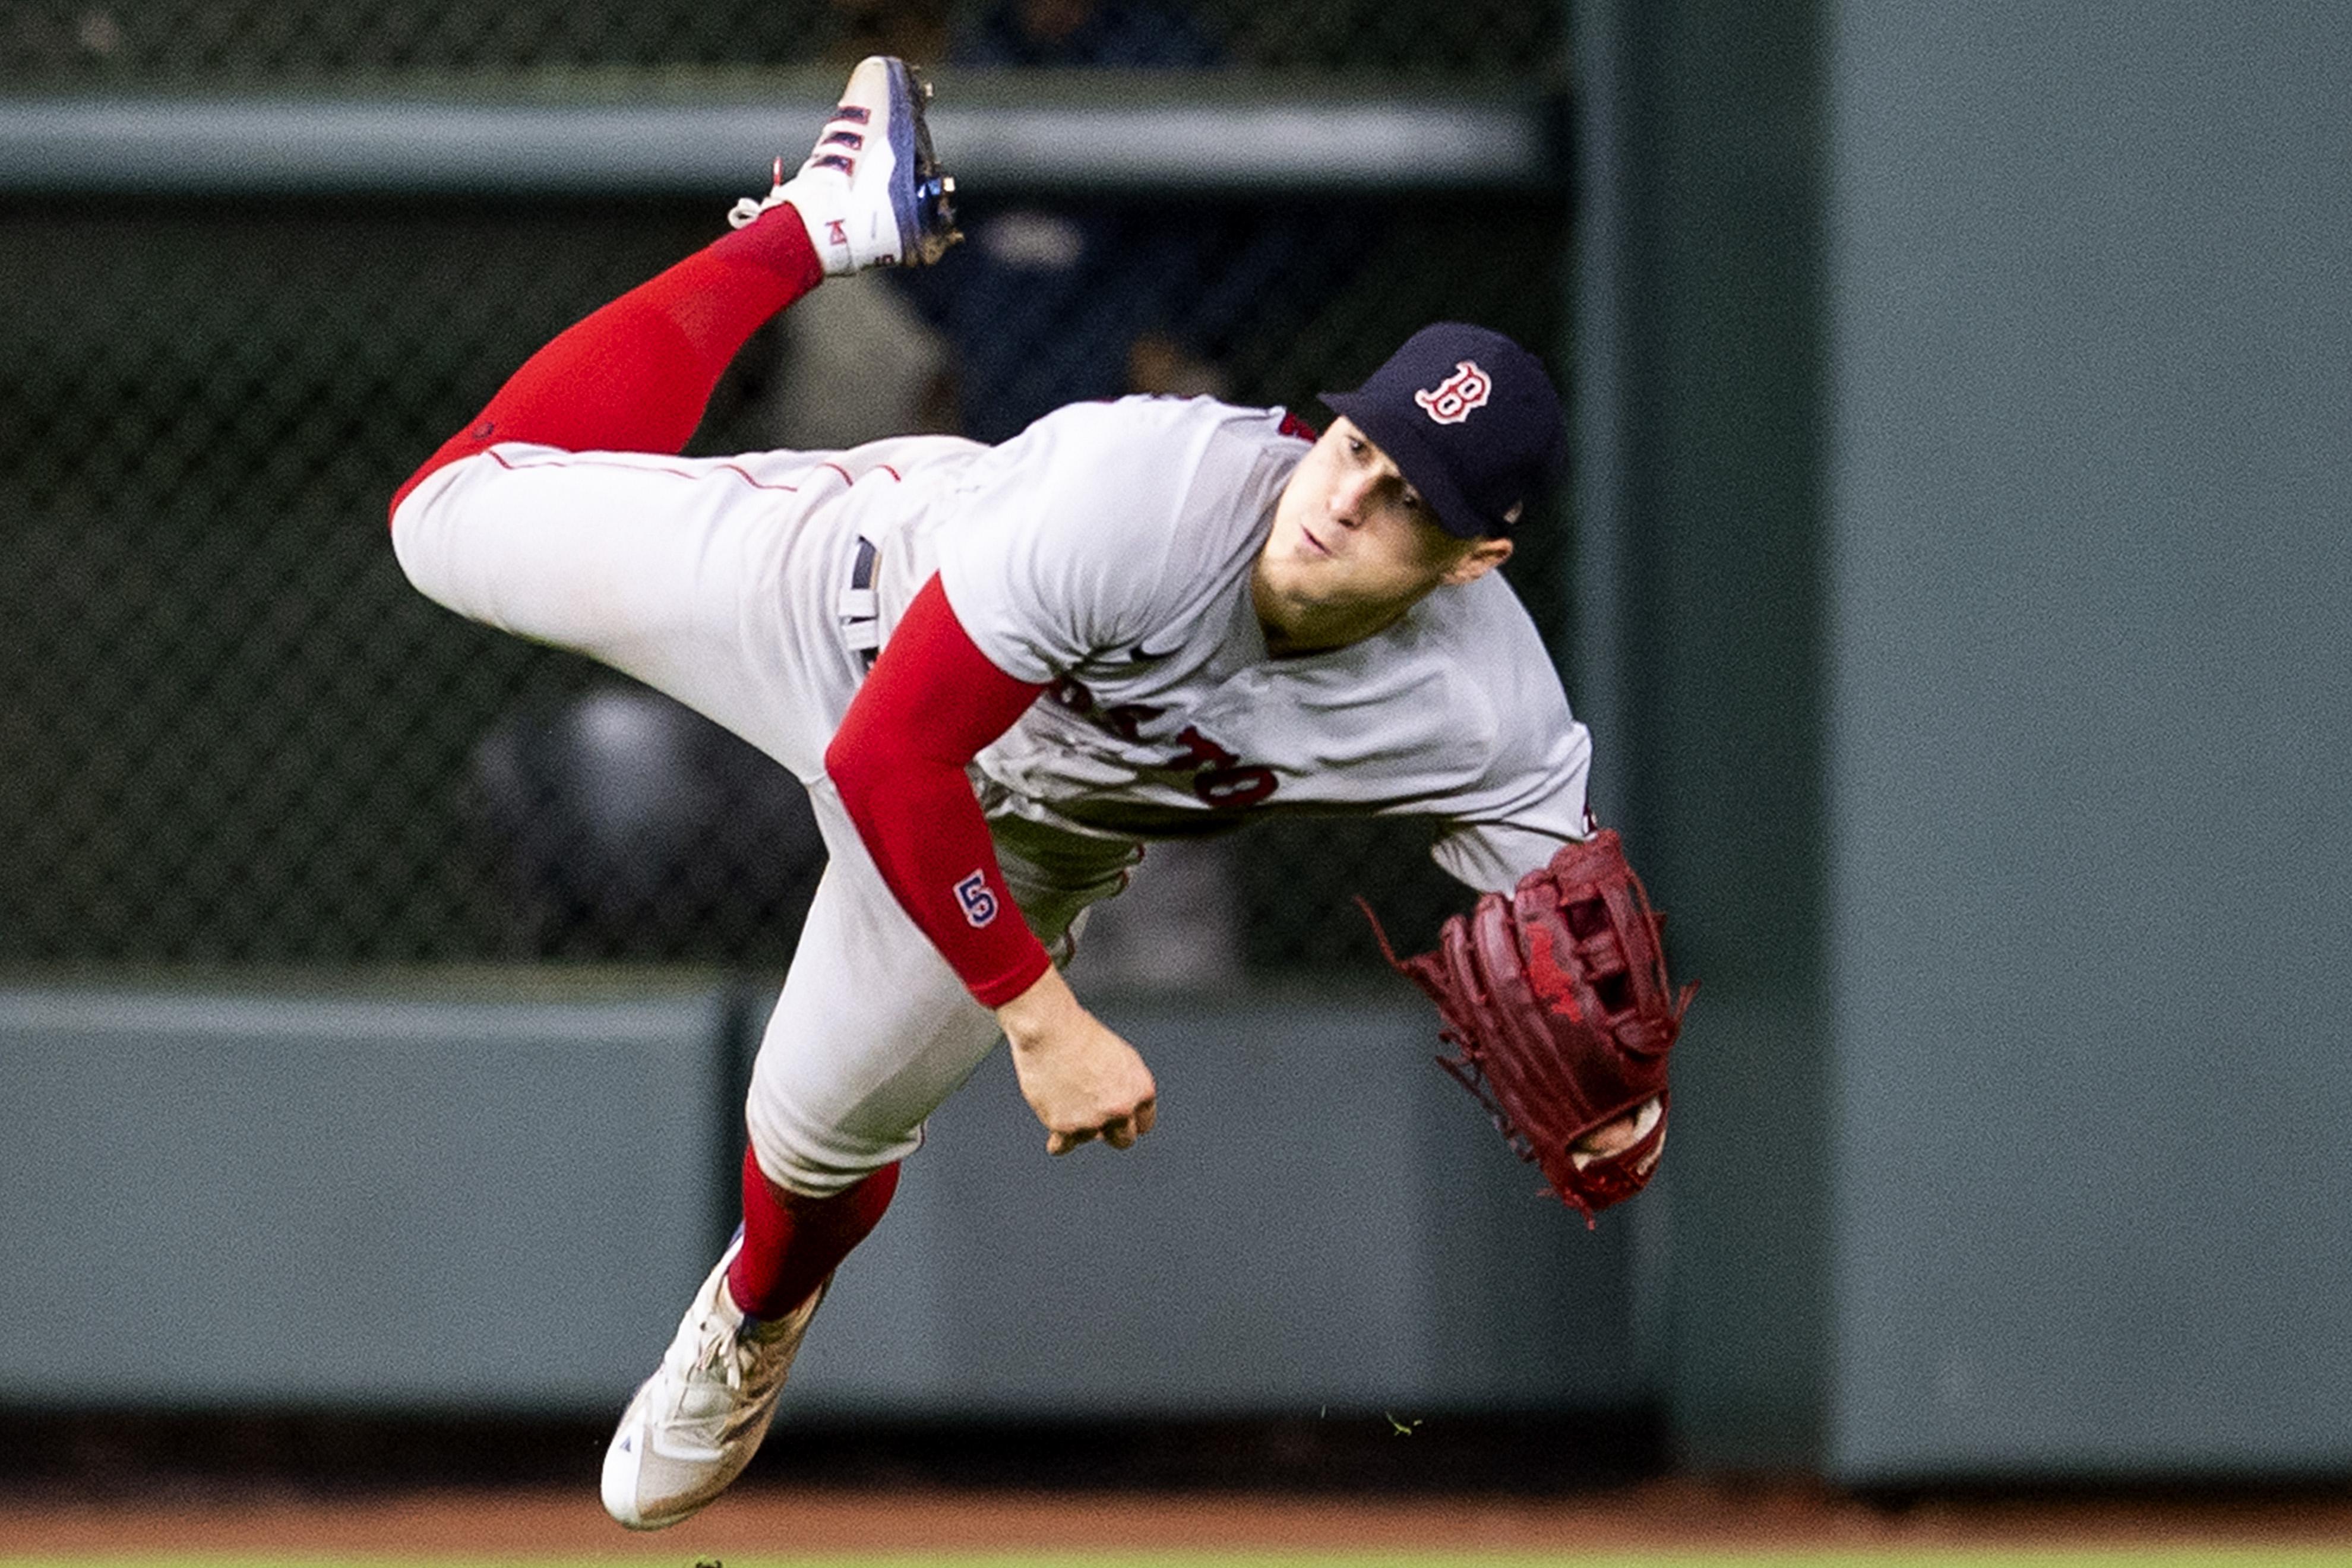 Championship Series - Boston Red Sox v Houston Astros - Game One